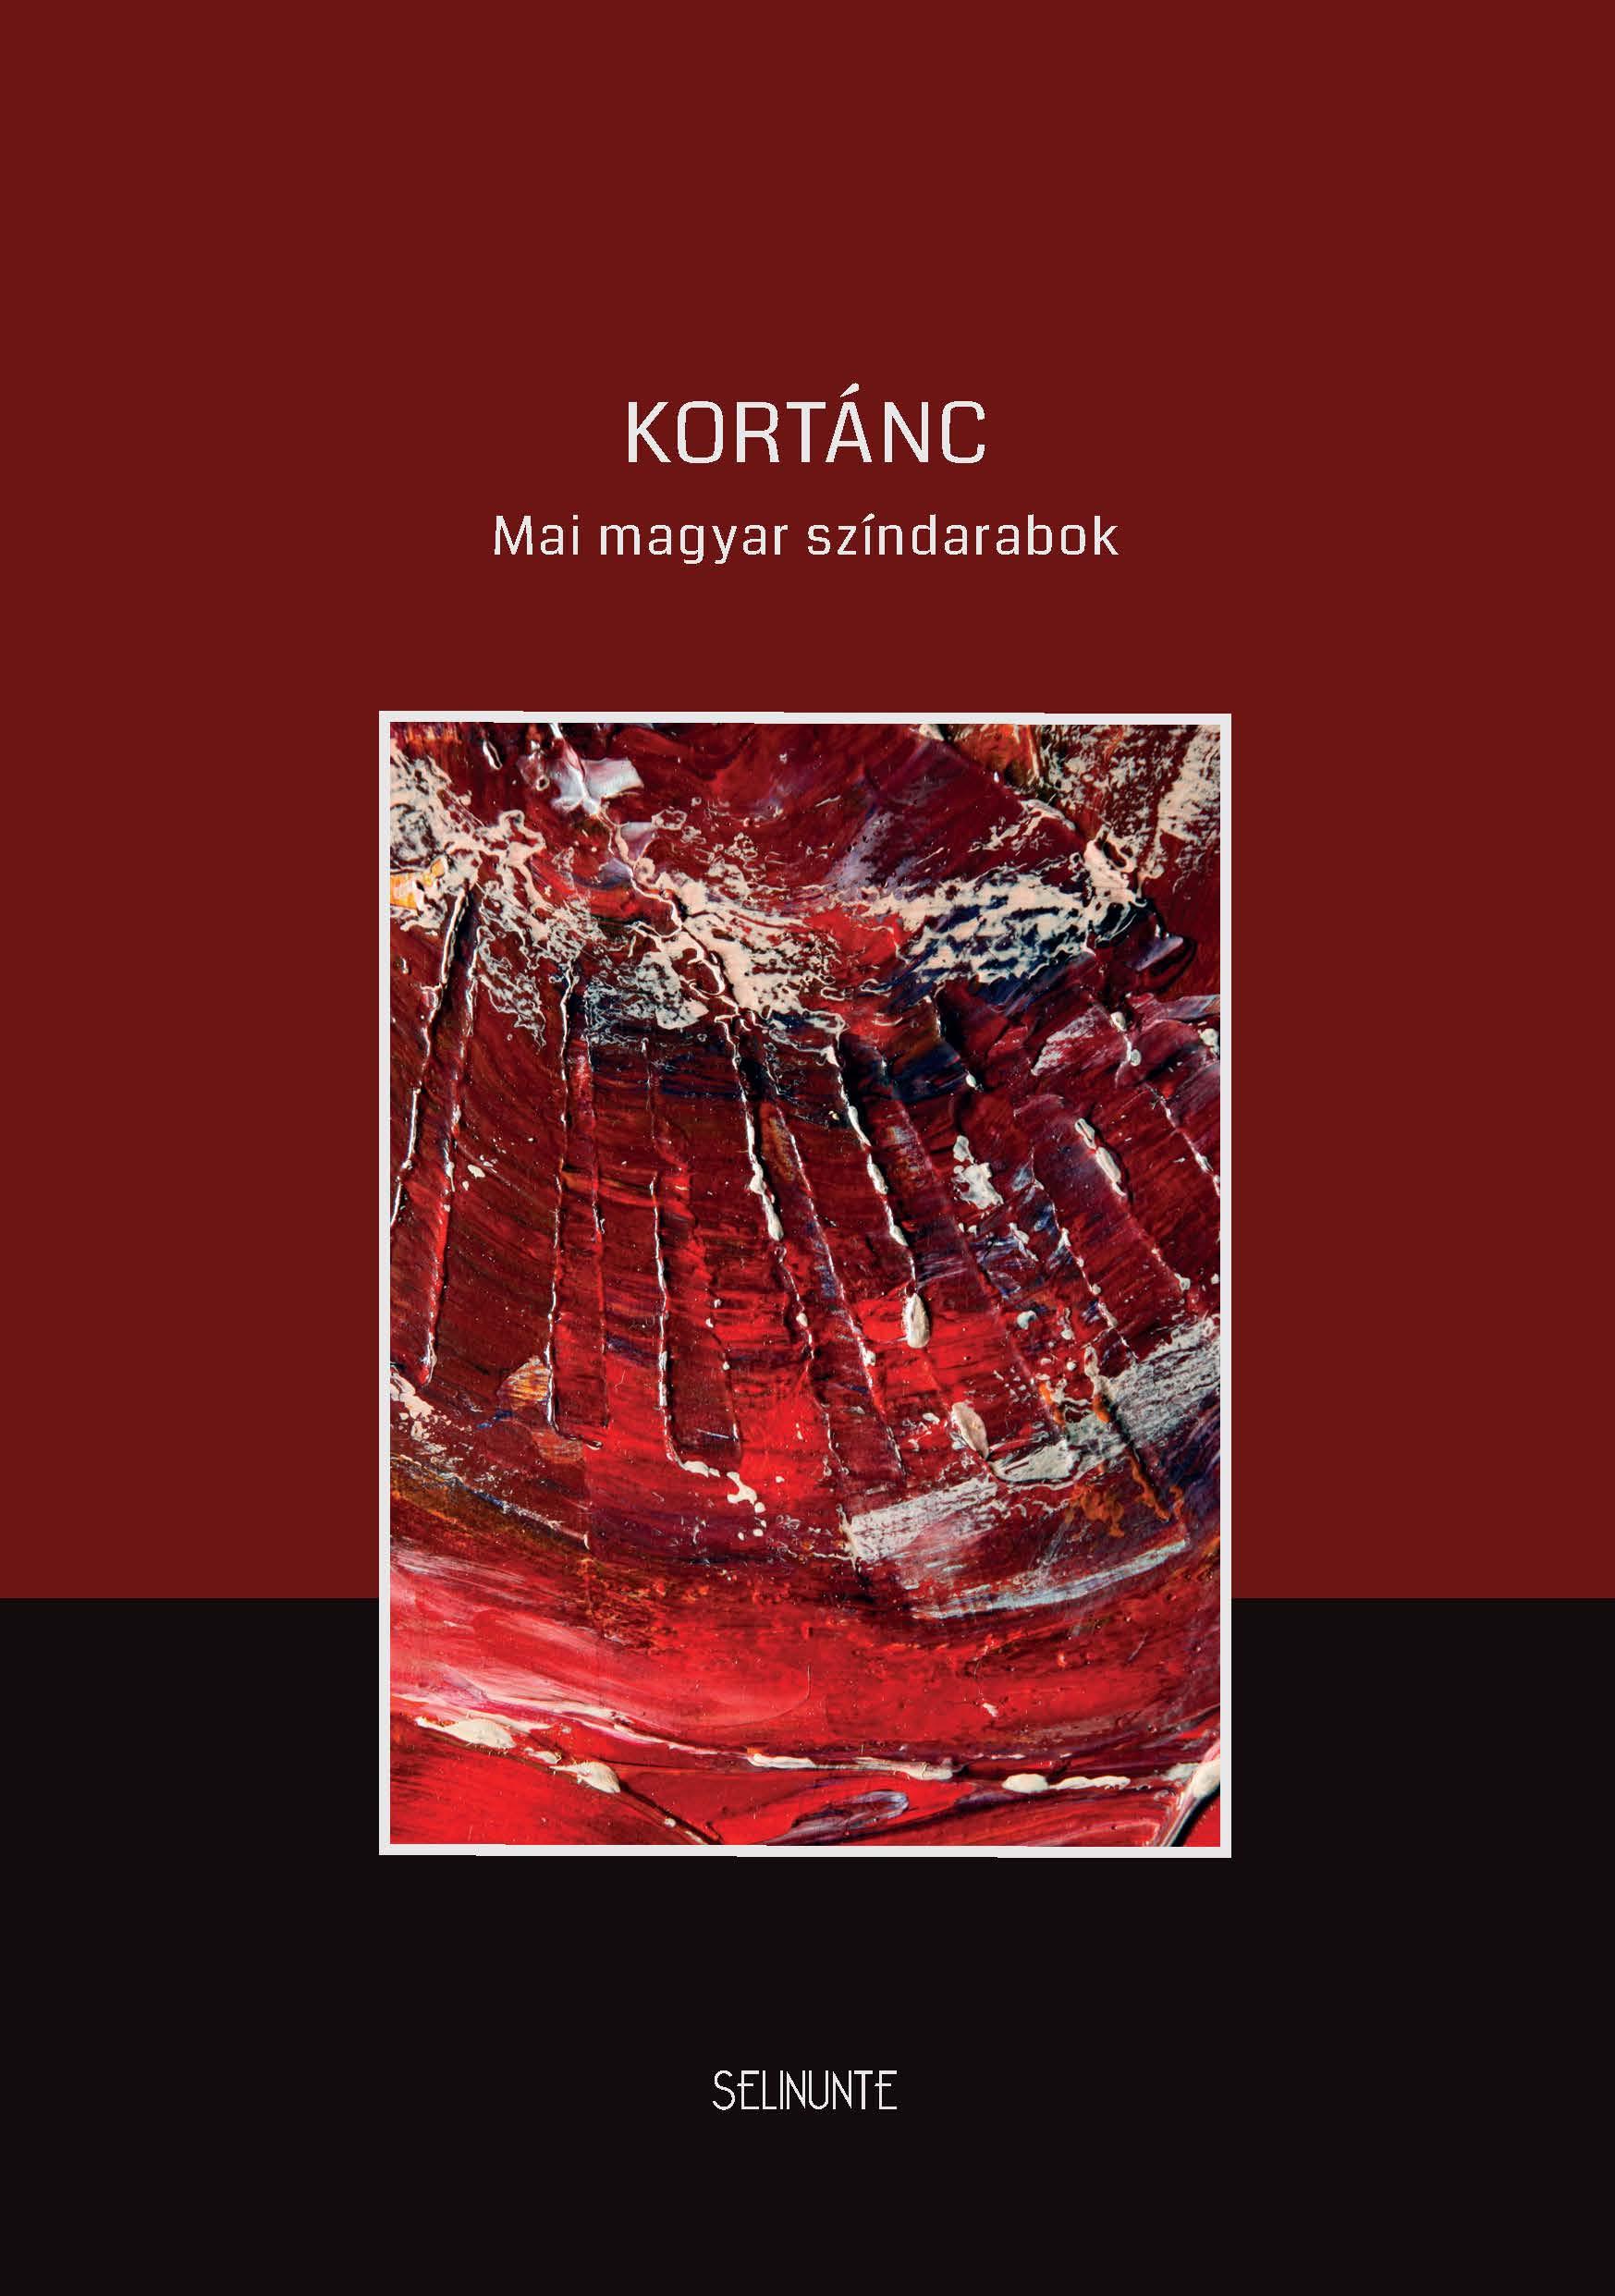 Kortánc. Mai magyar színdarabok